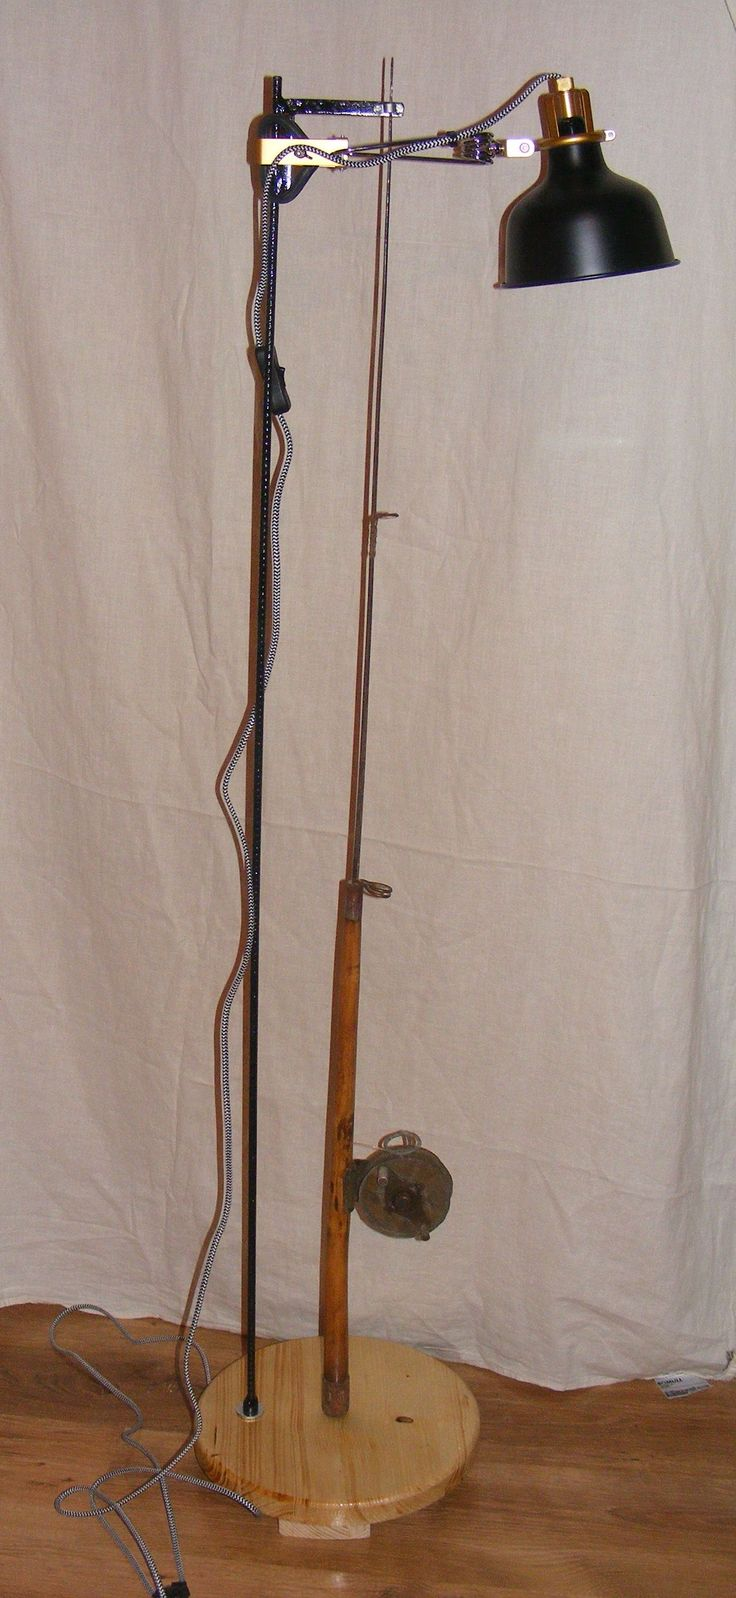 The 60 years  hand made fishing rod lamp